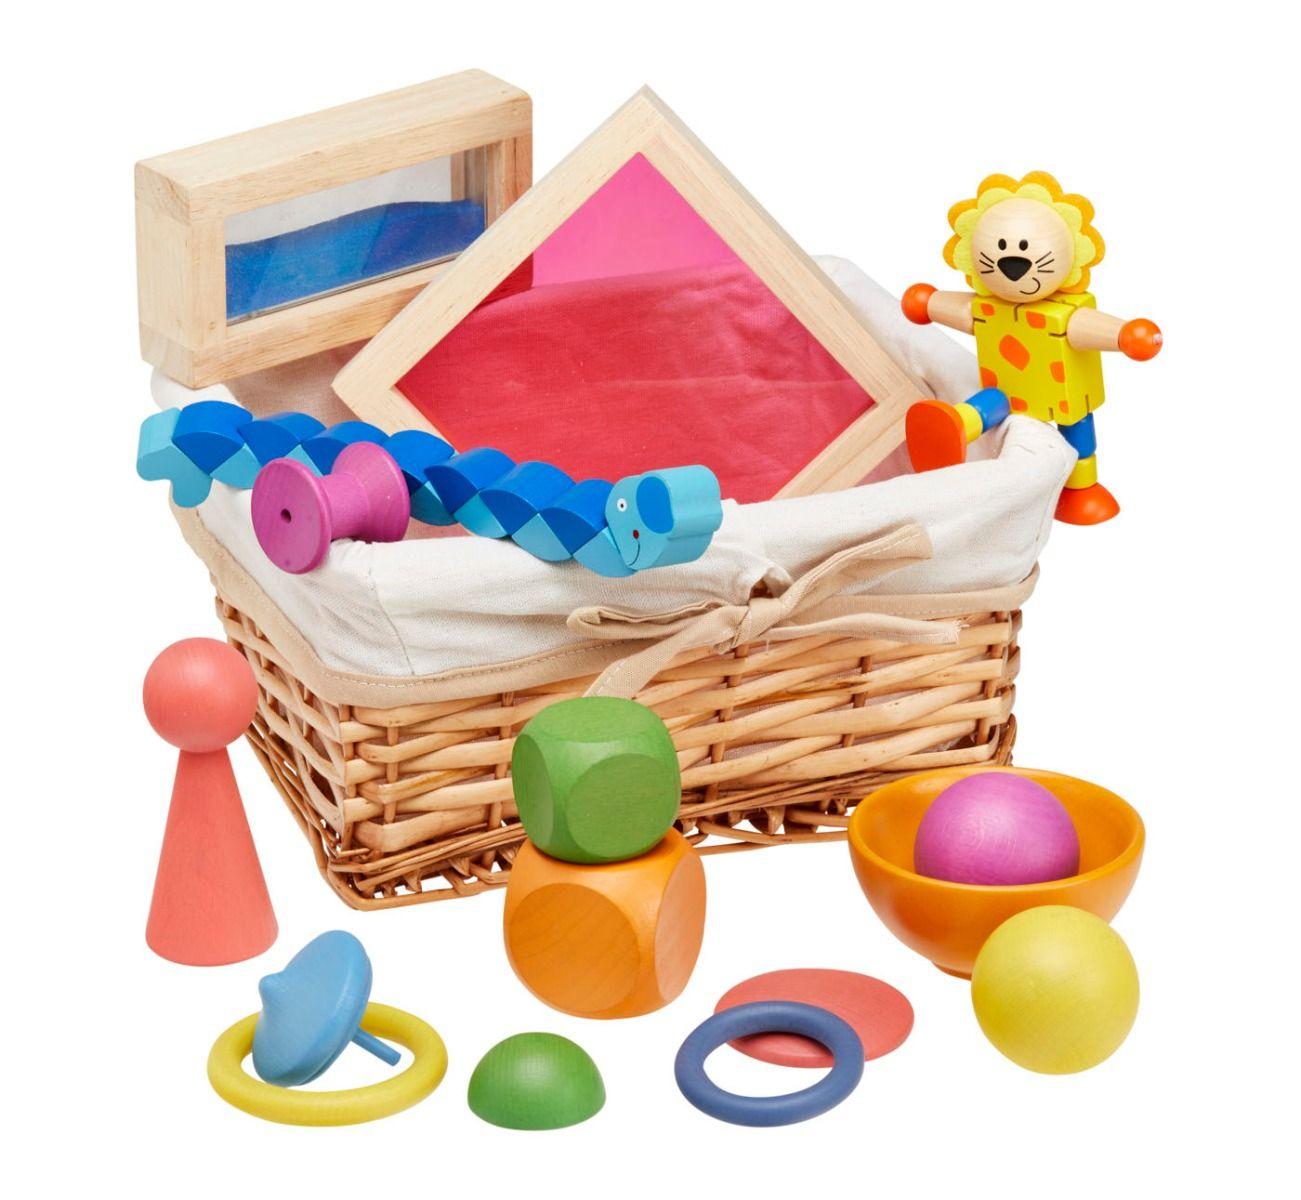 Rainbow Wooden Exploration Basket